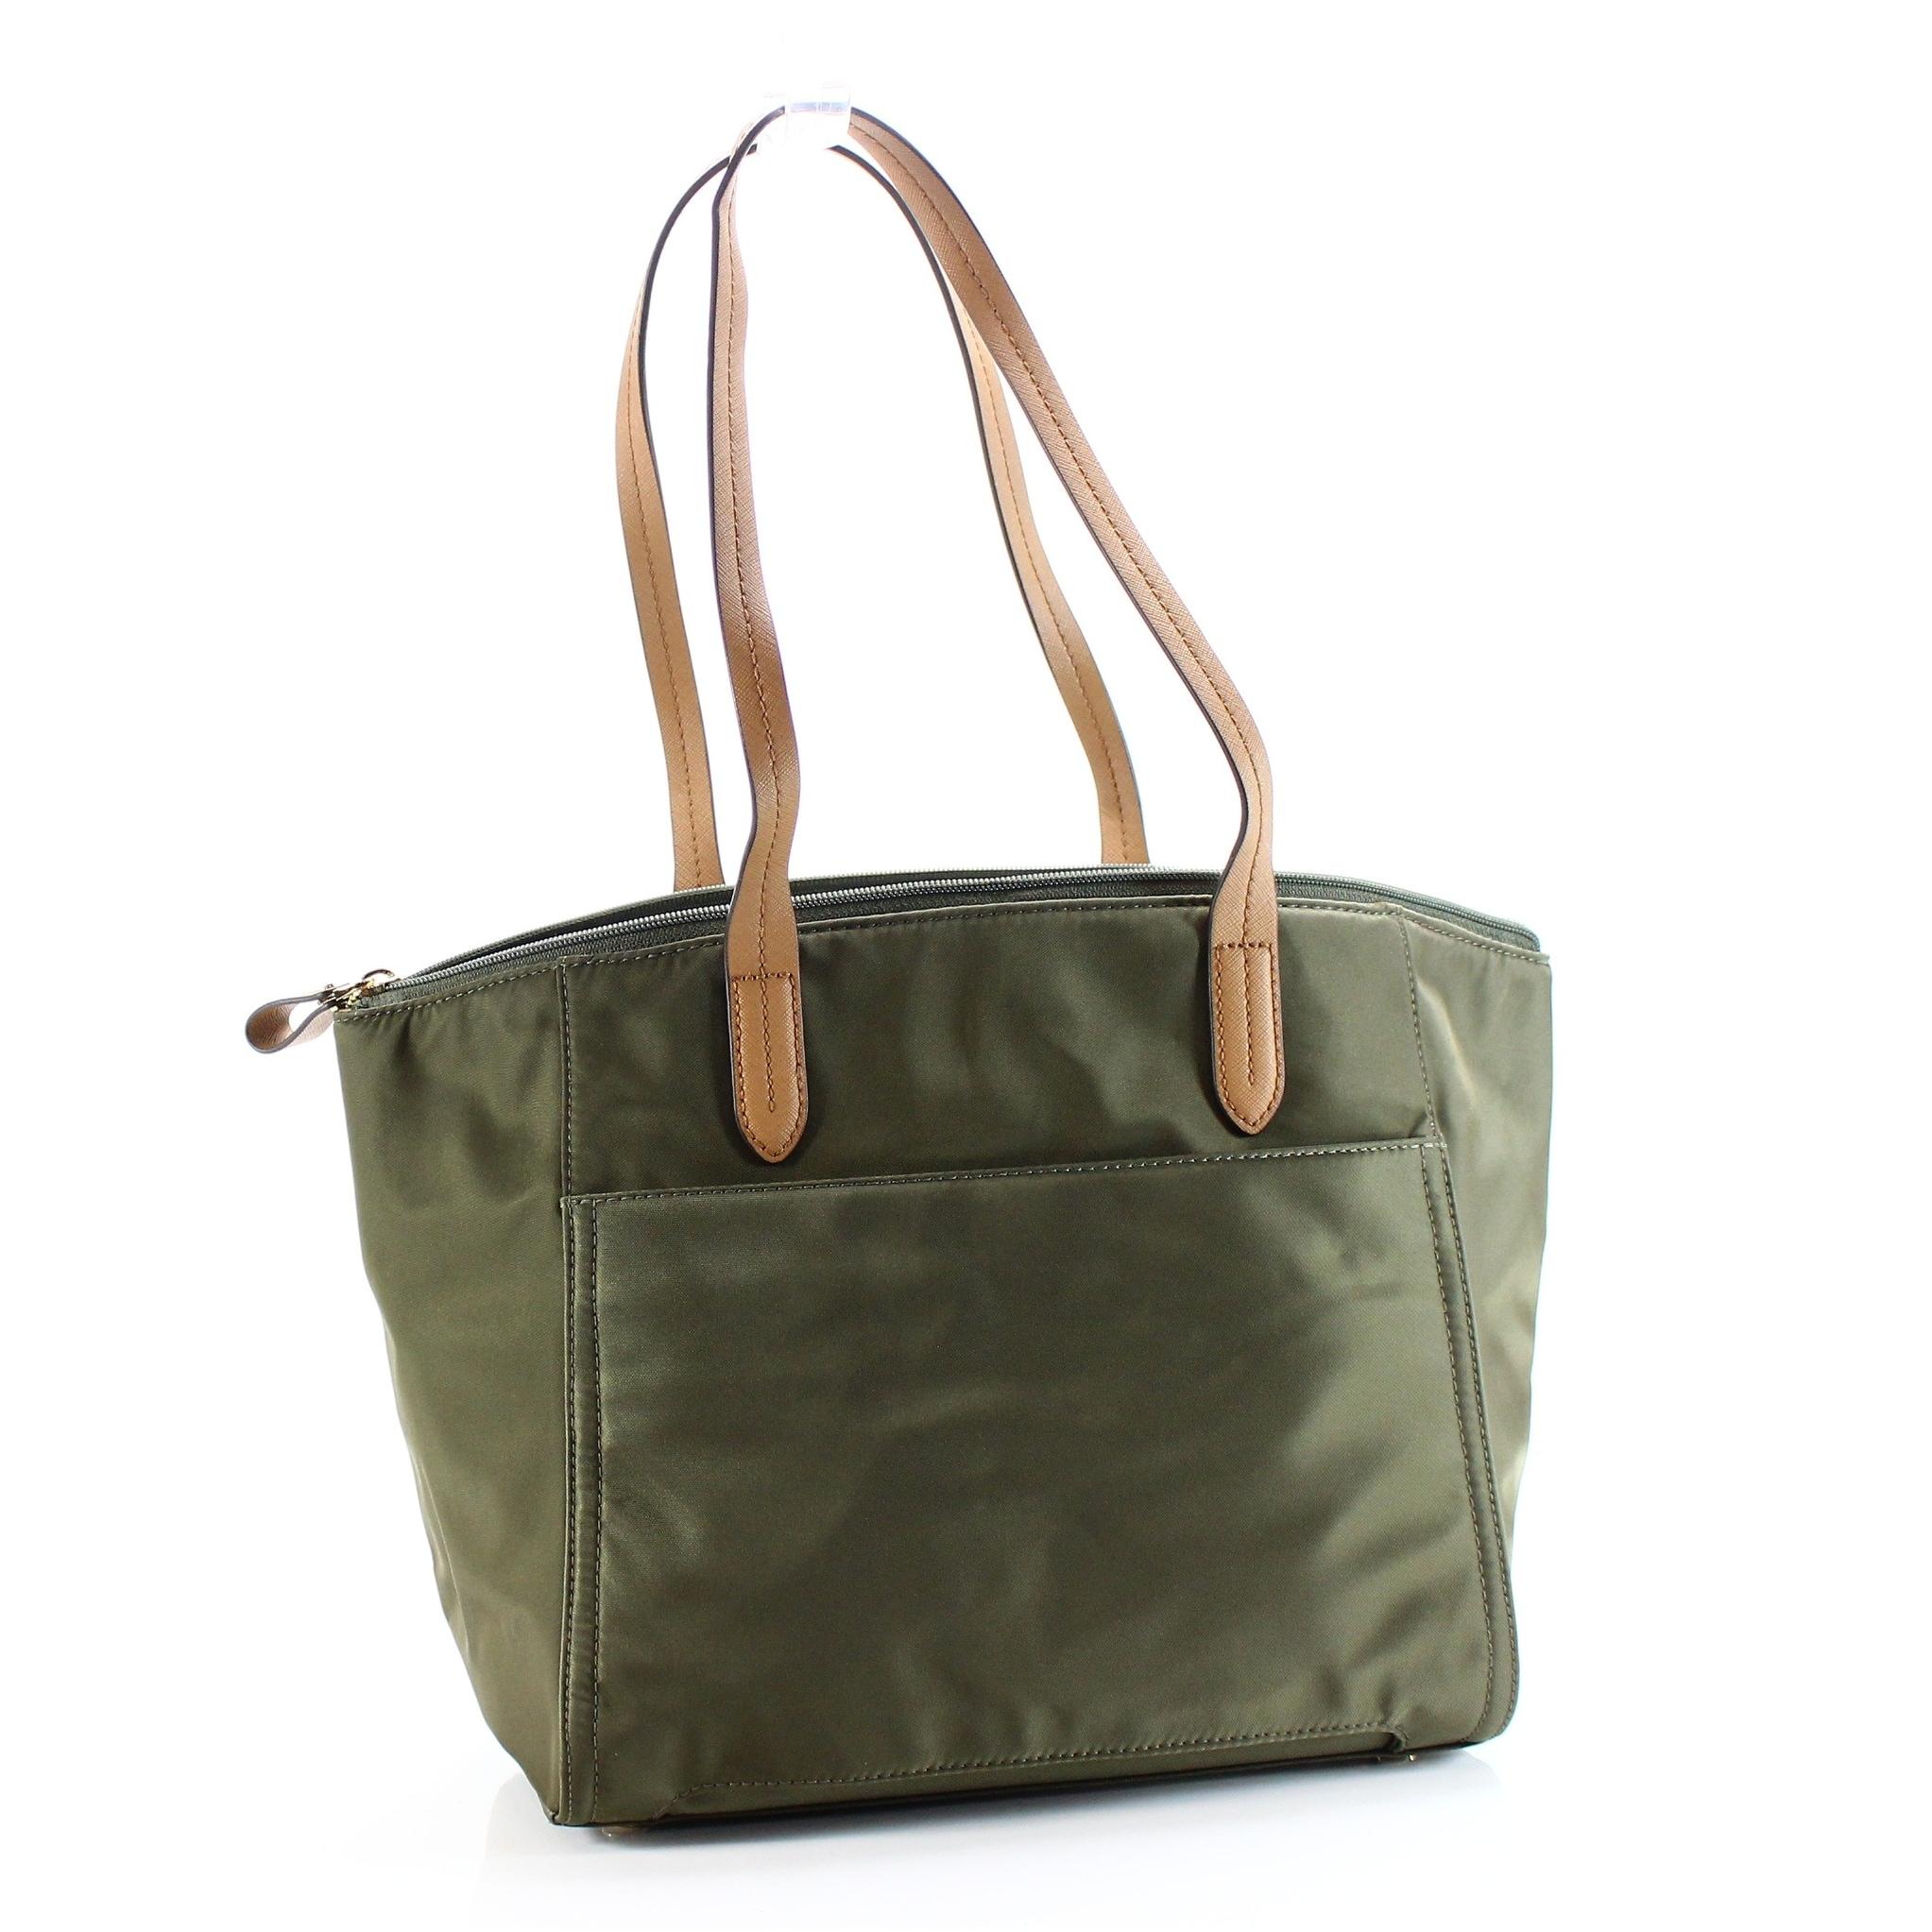 ead06c9ce909 Shop Michael Kors NEW Kelsey Olive Green Medium Top-Zip Tote Handbag ...